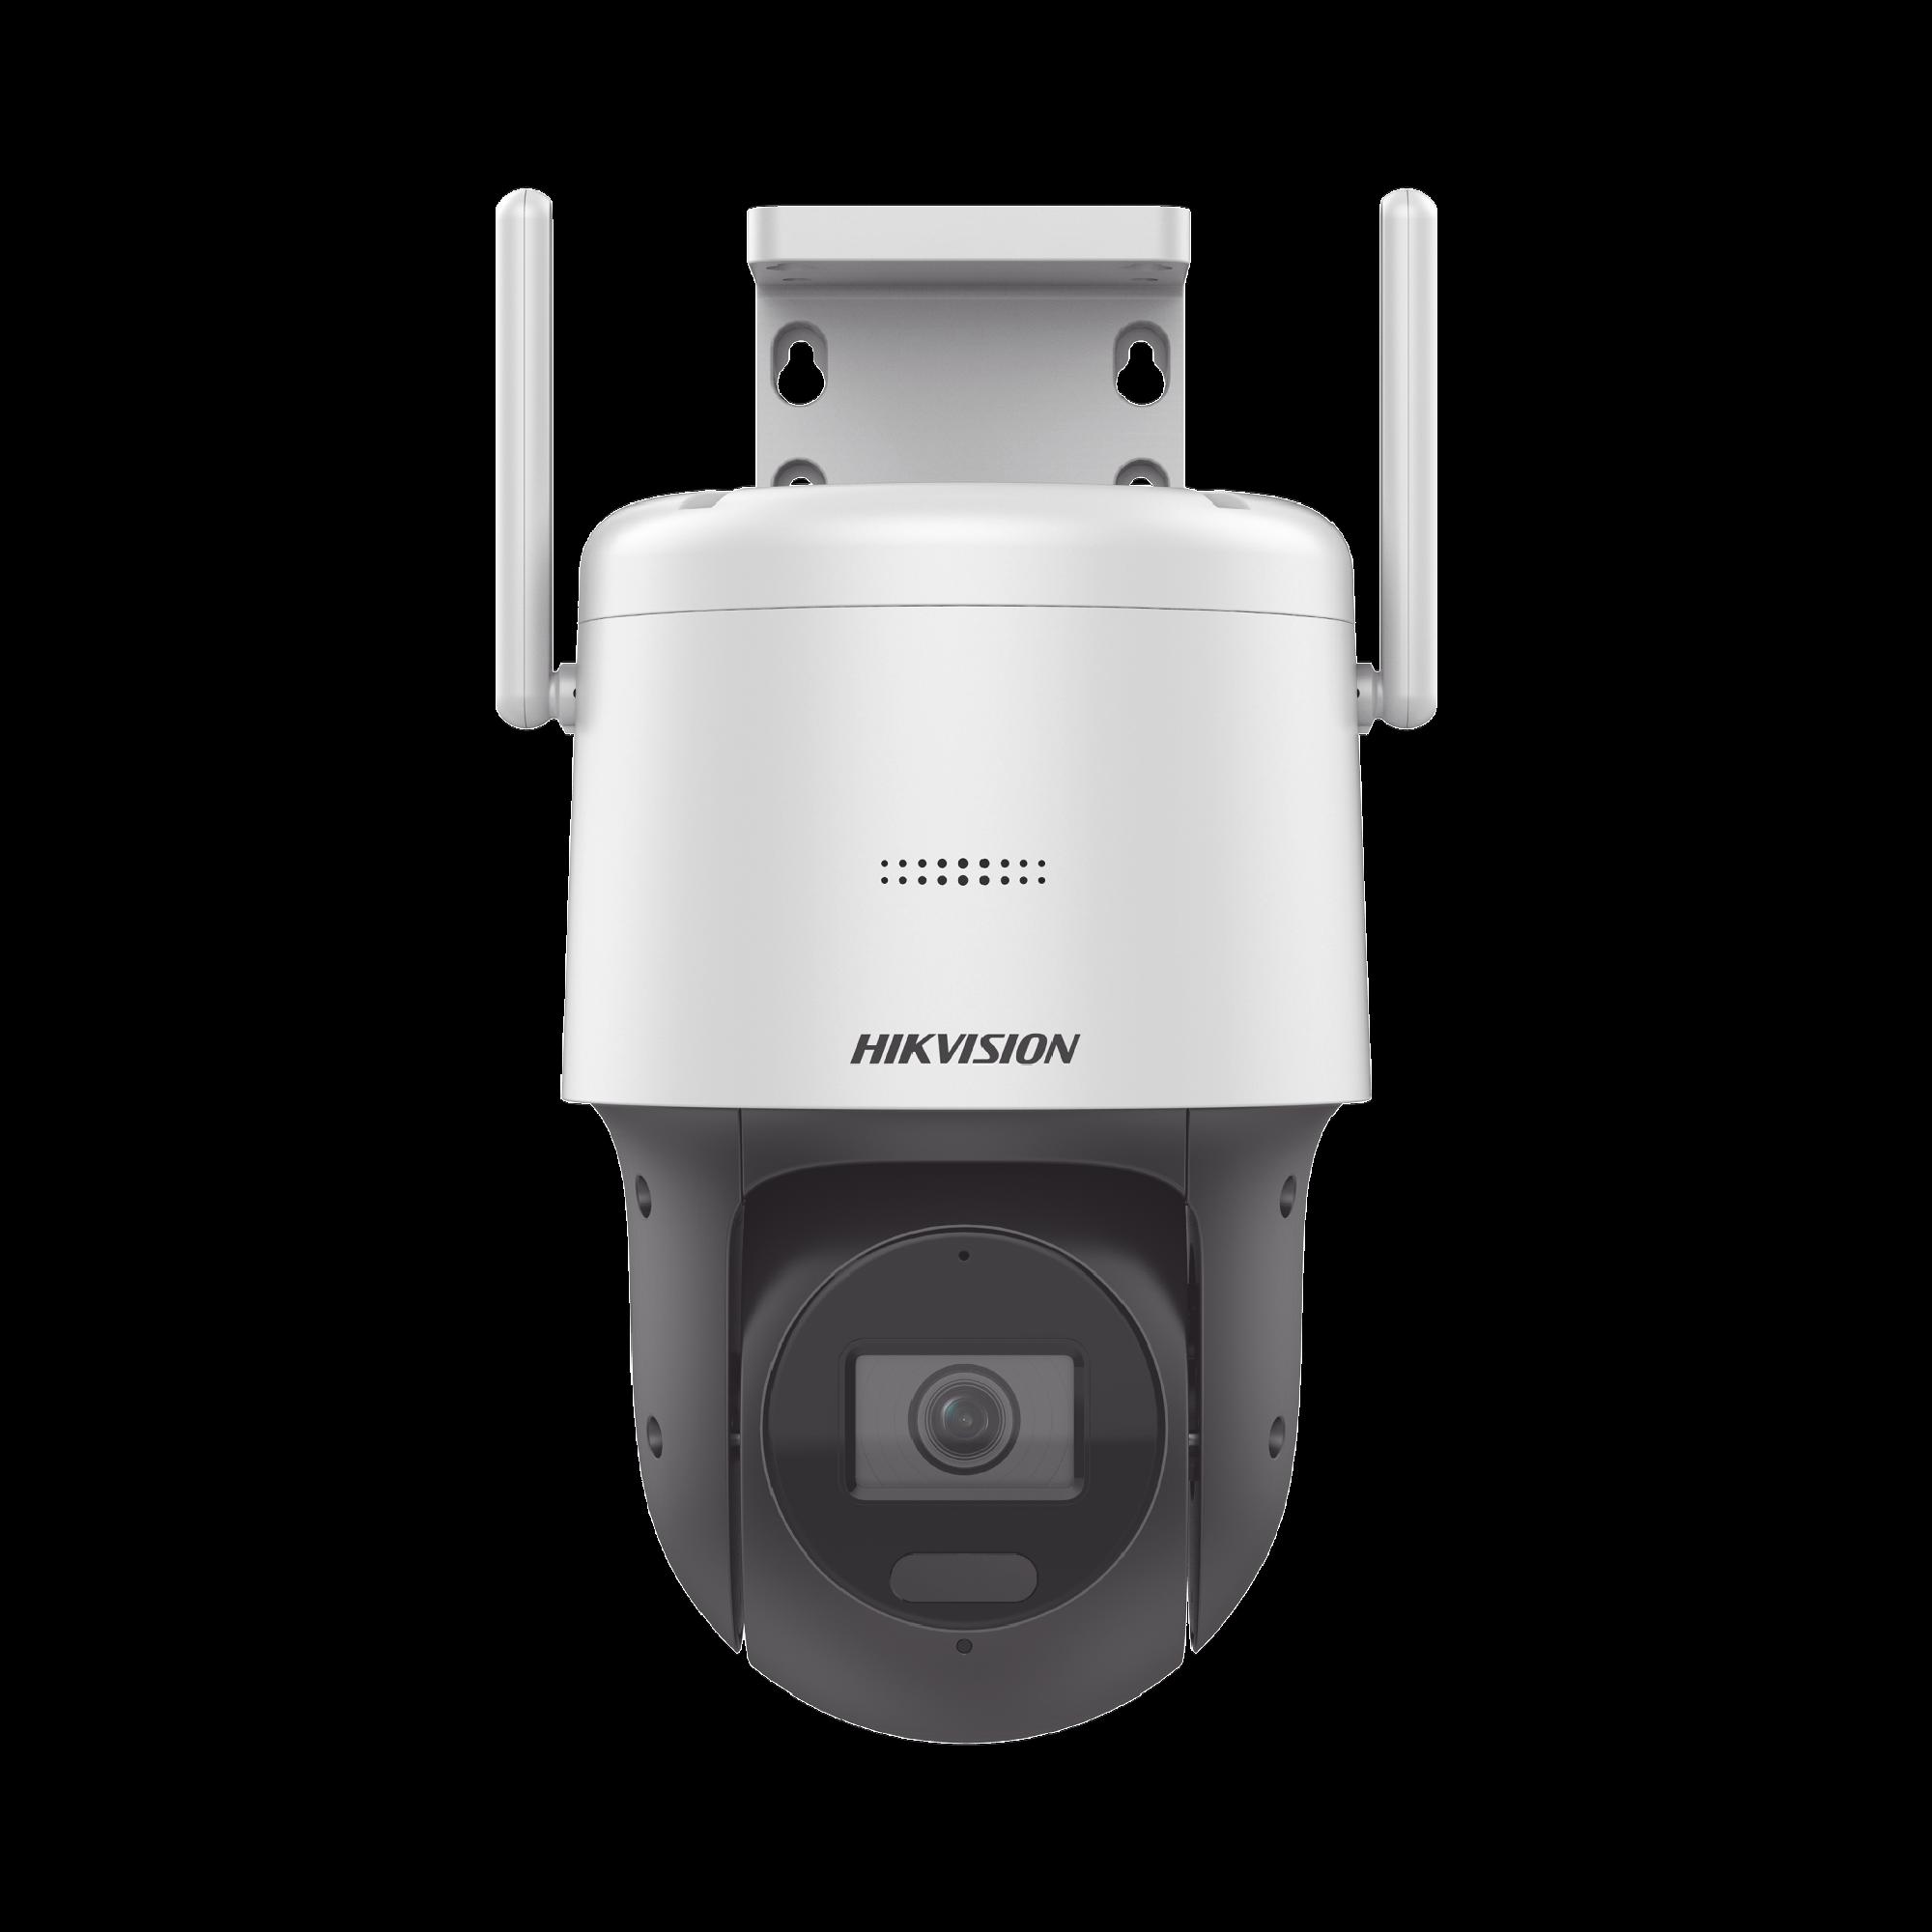 Domo IP PT 4 Megapixel / Lente 2.8 mm / 30 mts IR EXIR / Exterior IP66 / dWDR / Ultra Baja Iluminación / Micrófono y Bocina Integrada / Audio de Dos Vías/ WiFi / dWDR